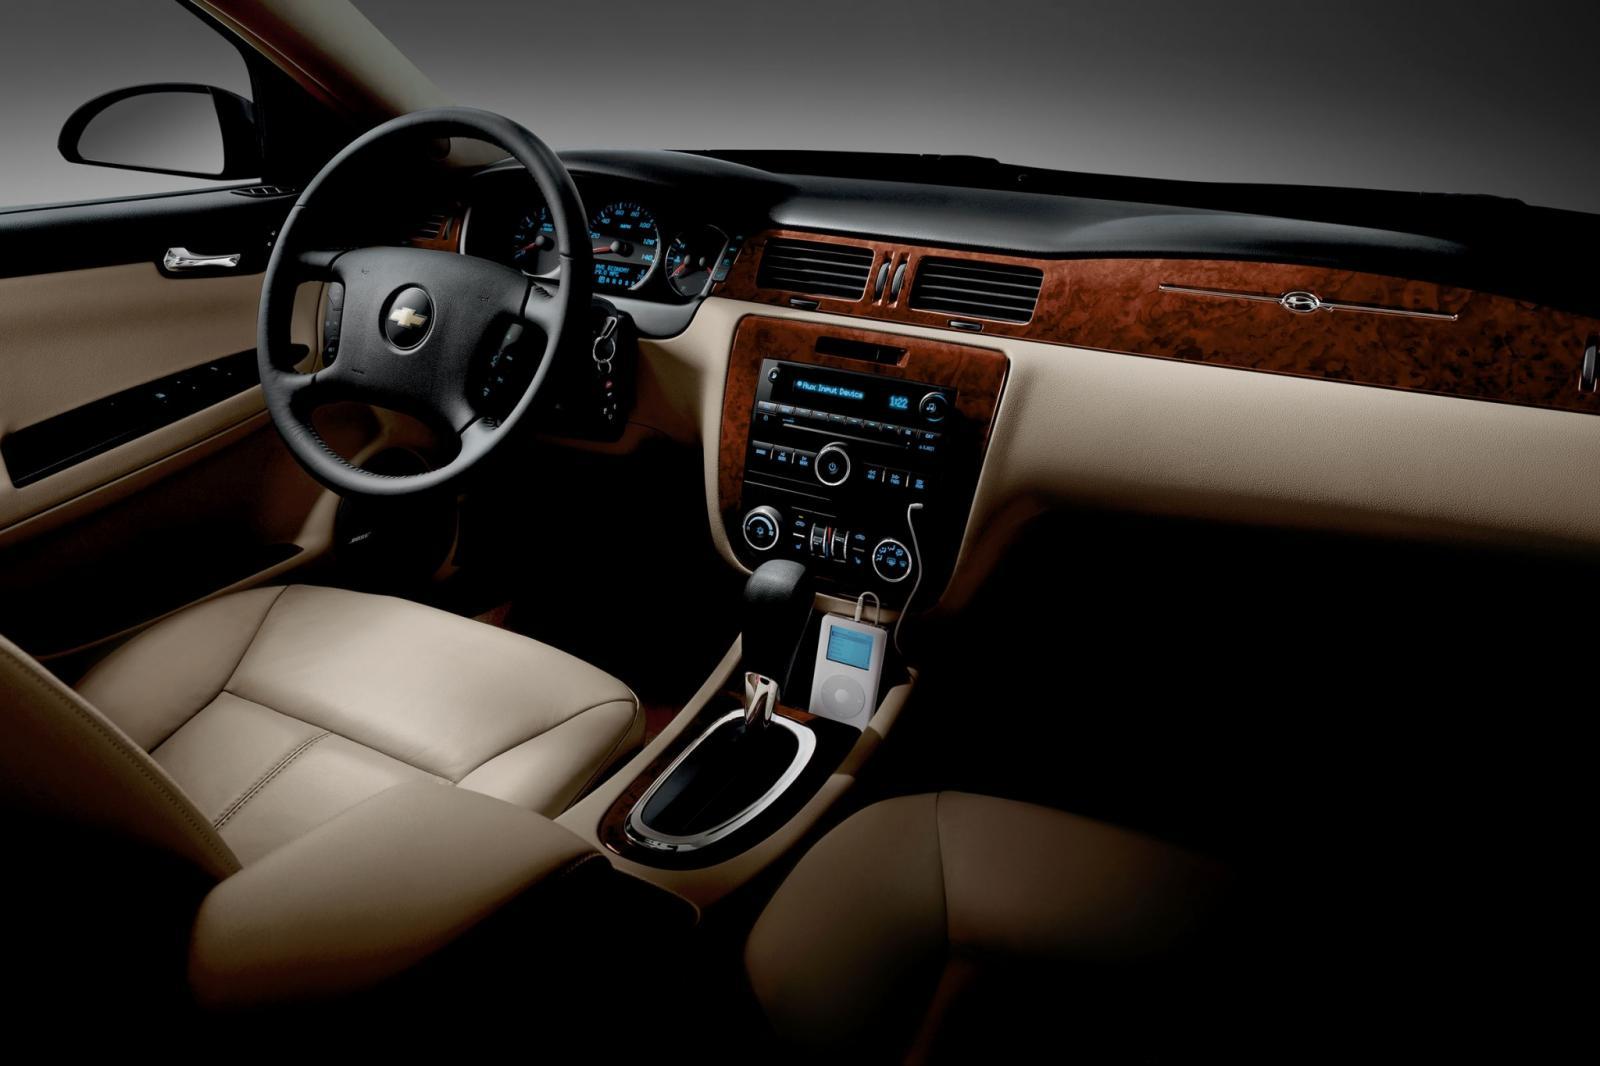 Impala 2007 Chevy Fuel Economy Old Photos